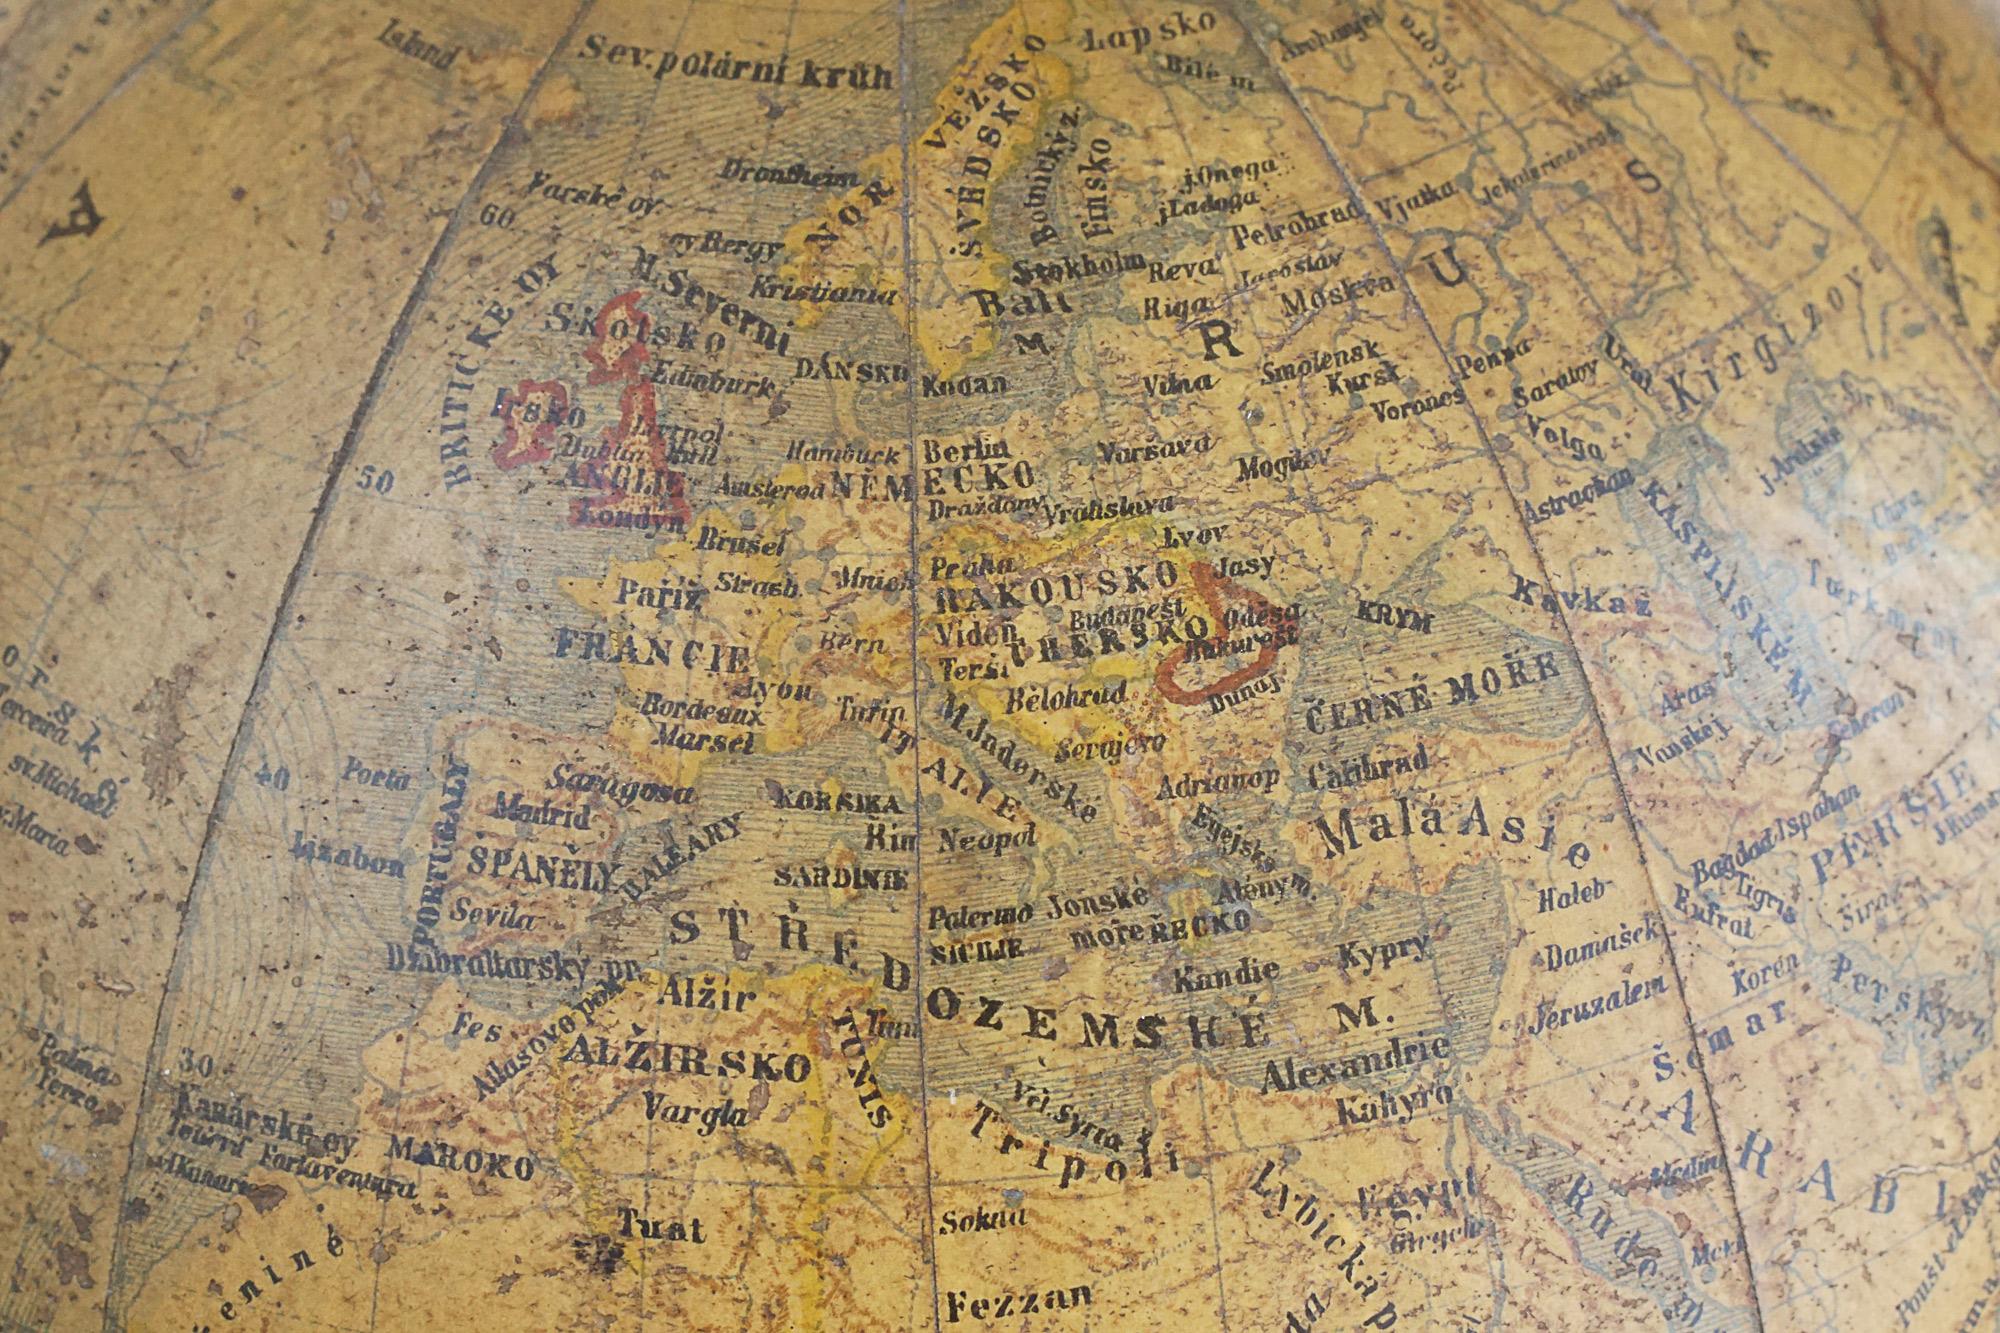 19th century Antique Terrestrial School Globe by Felkl & Son